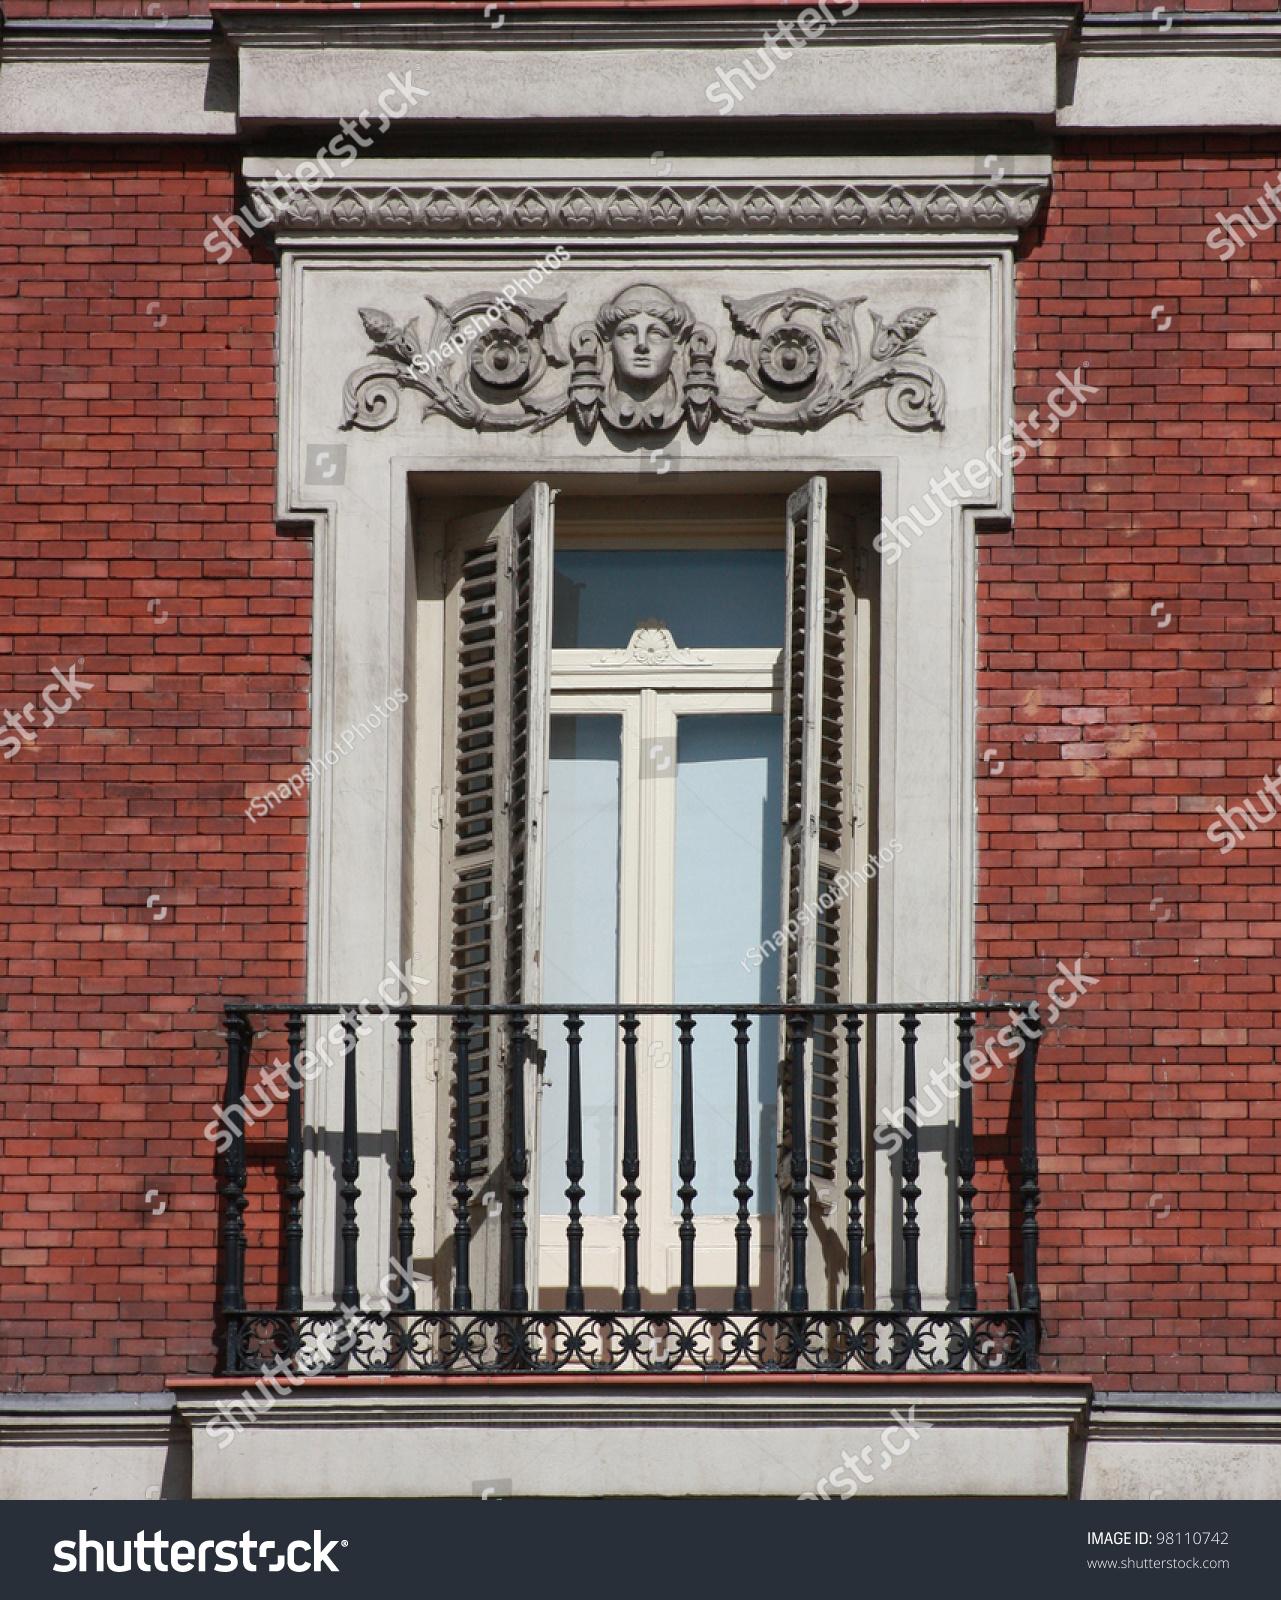 Brick Apartment Building Window neo classical gothic style window balcony stock photo 98110742